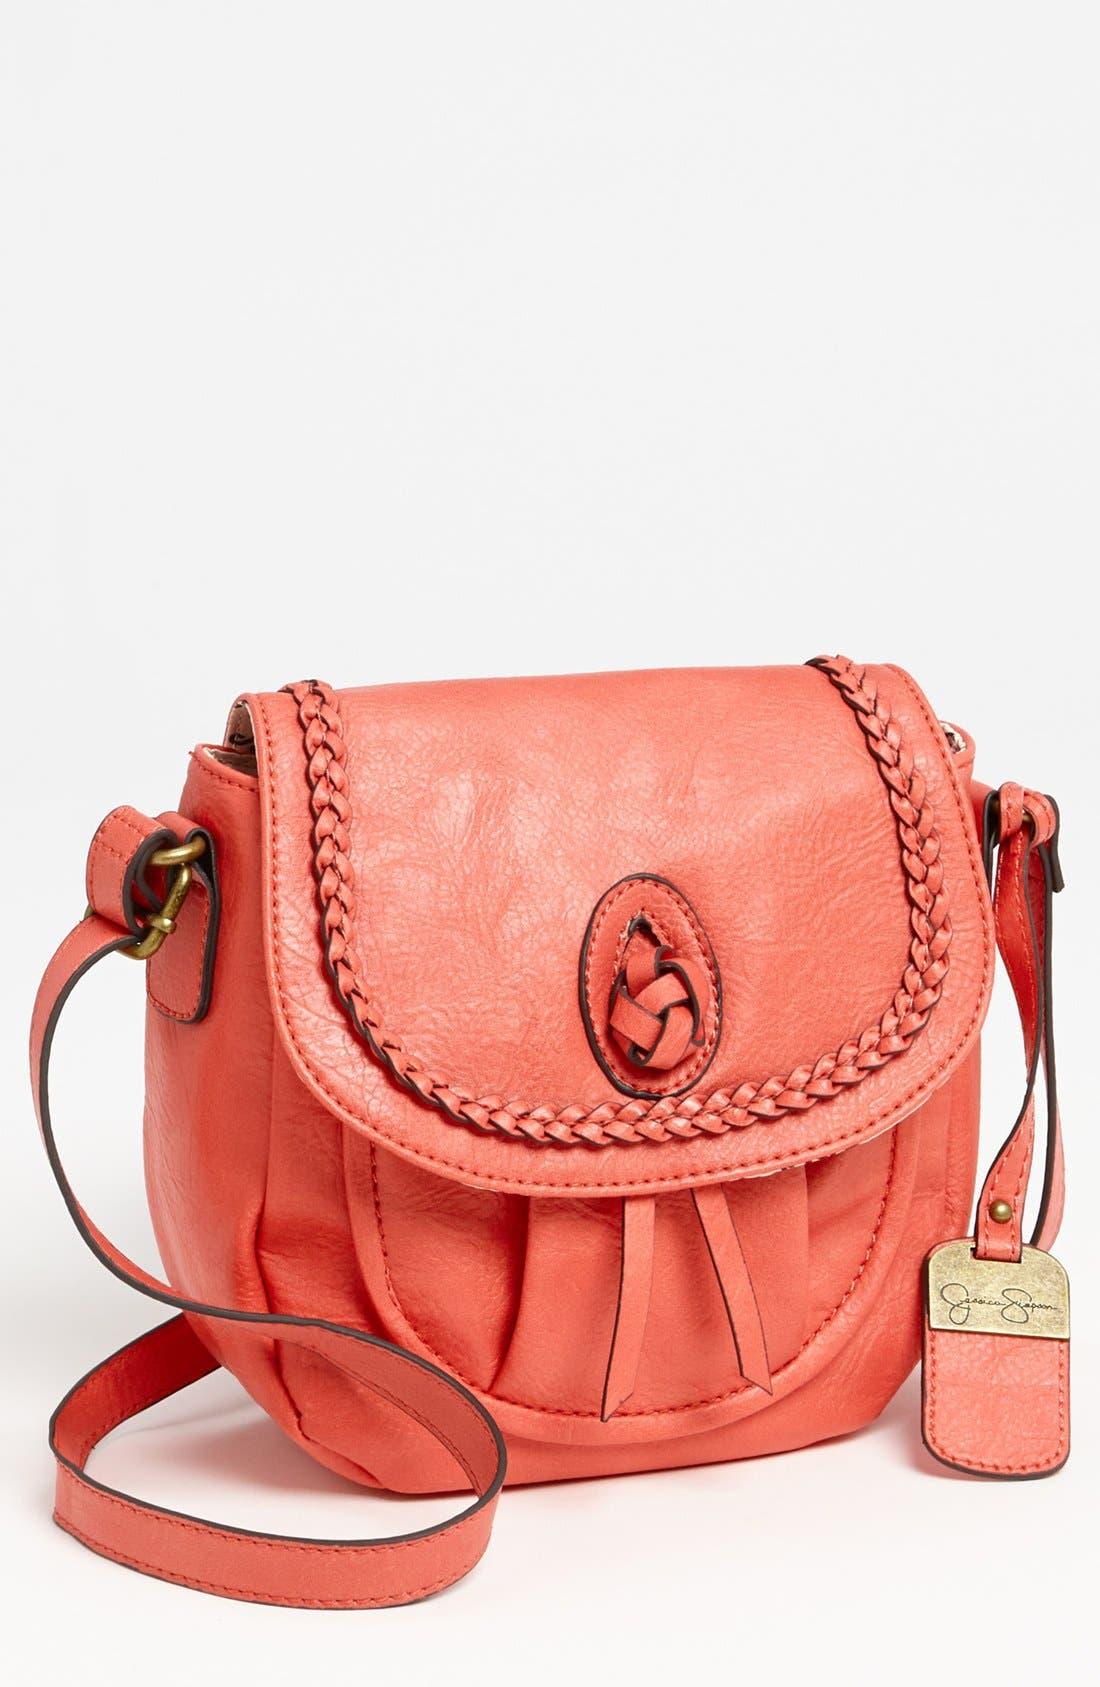 Main Image - Jessica Simpson 'Emma' Faux Leather Crossbody Bag